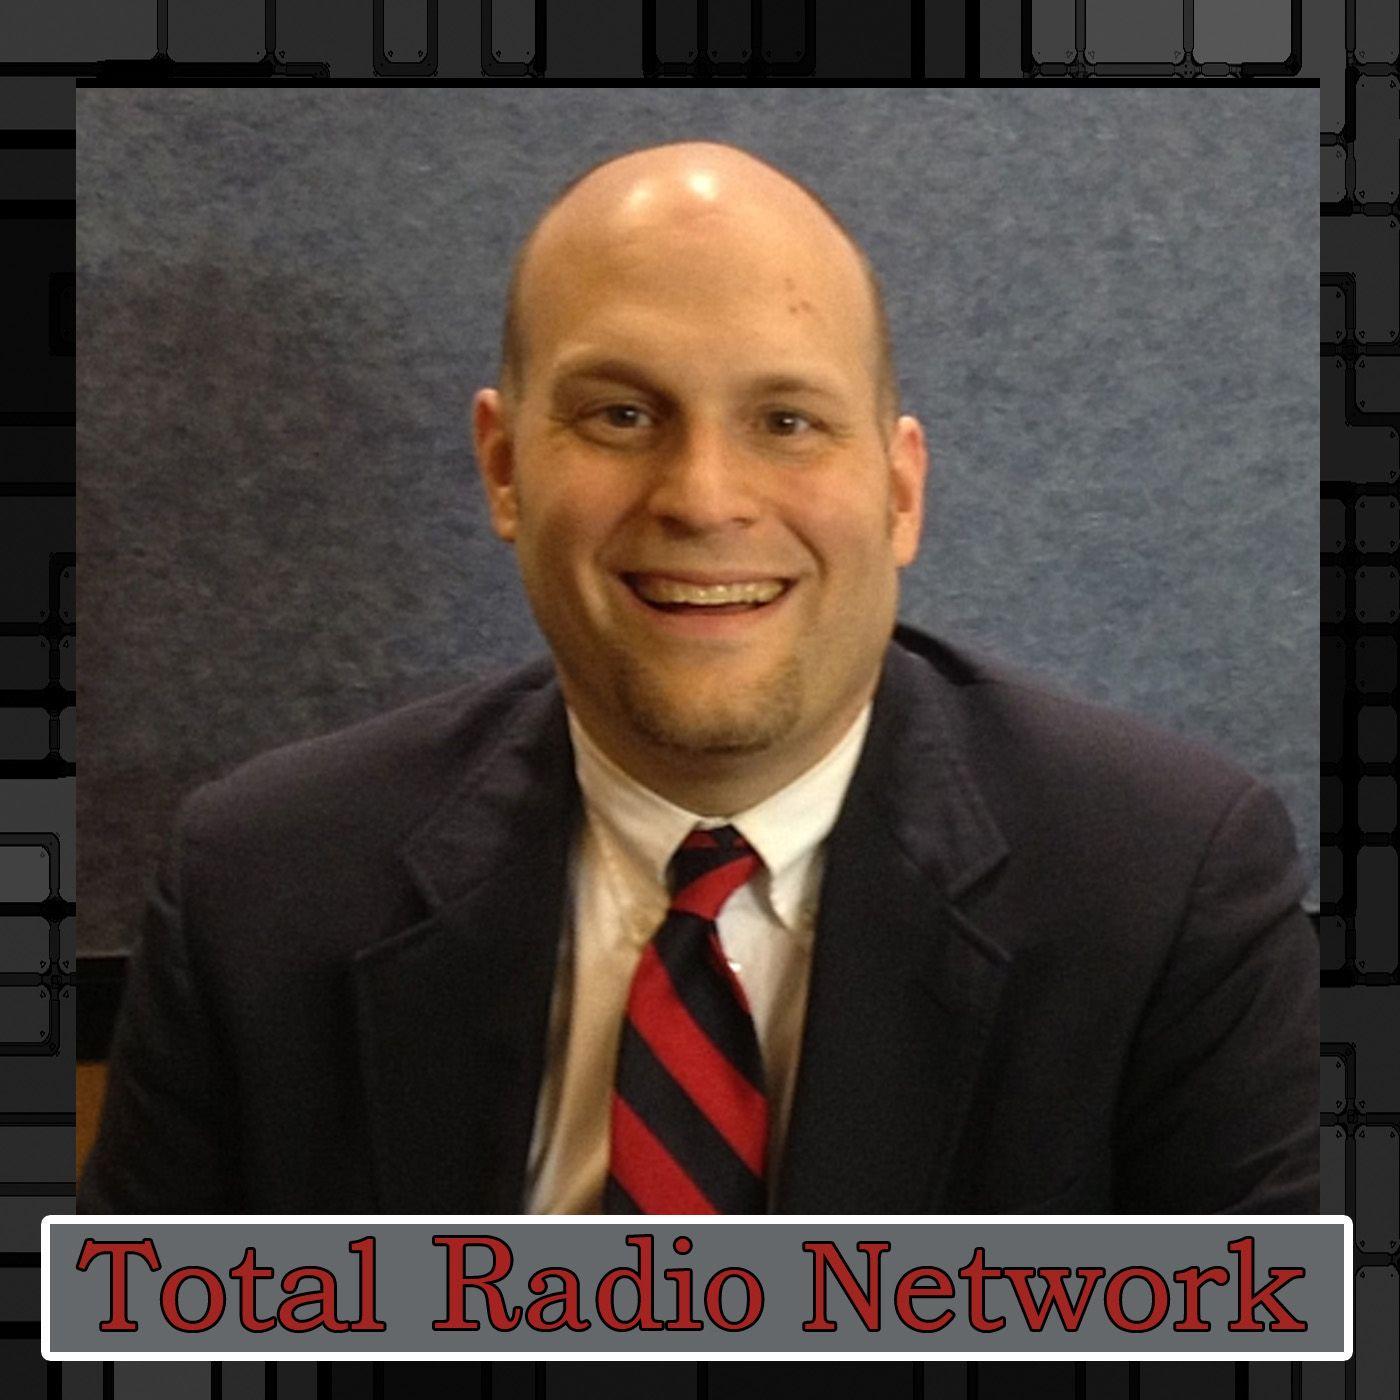 Total Radio Network